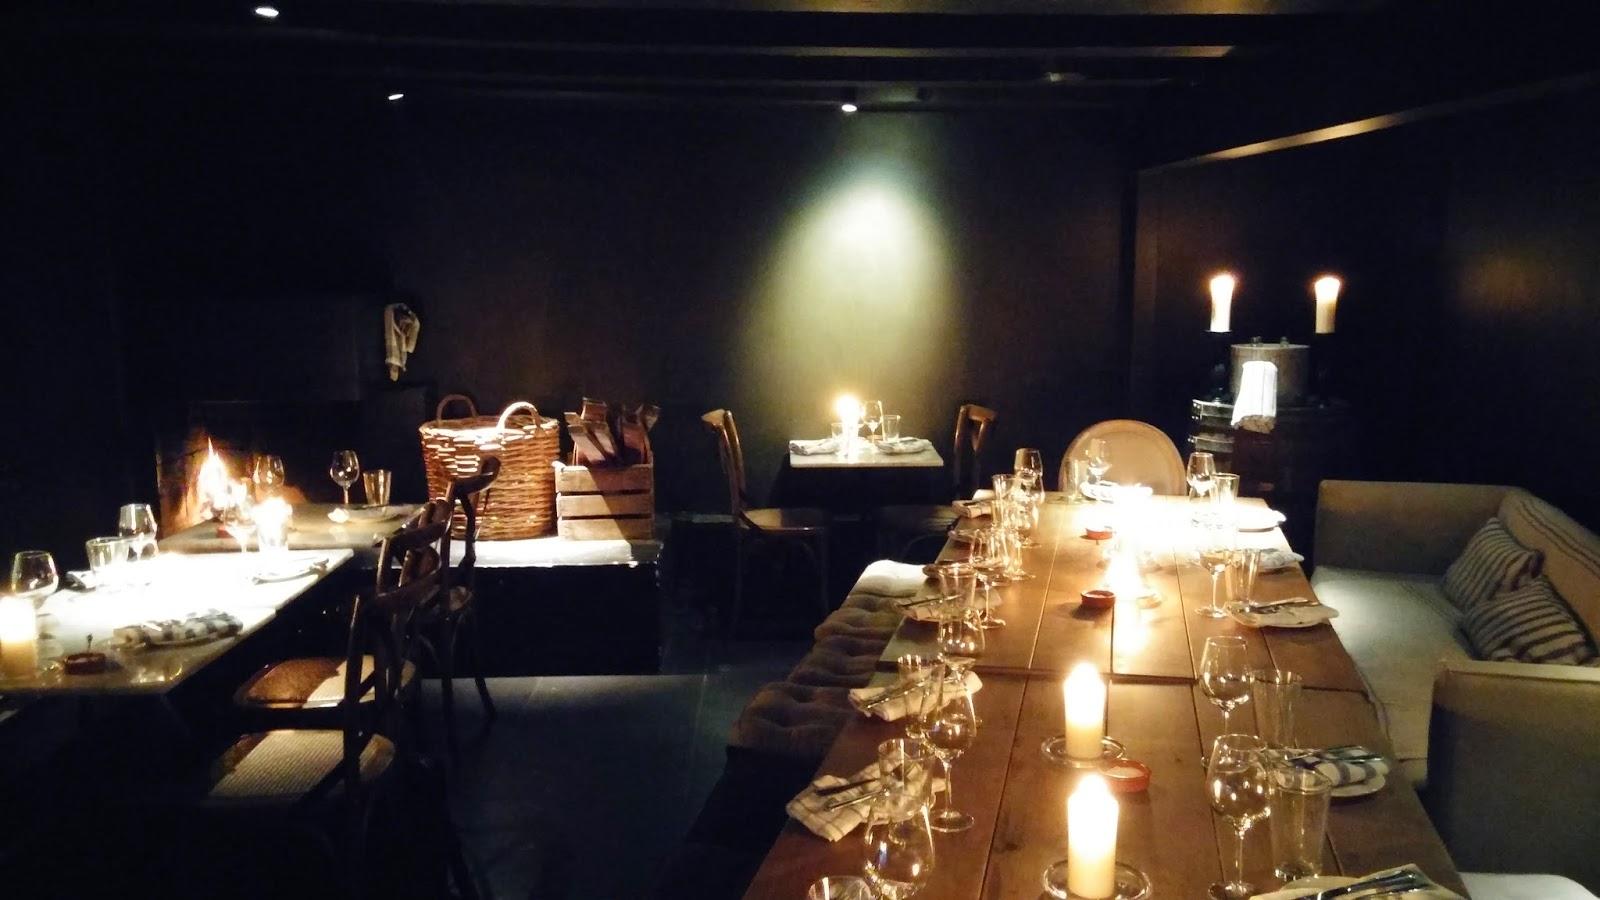 oslo eskorte romantiske restauranter i oslo